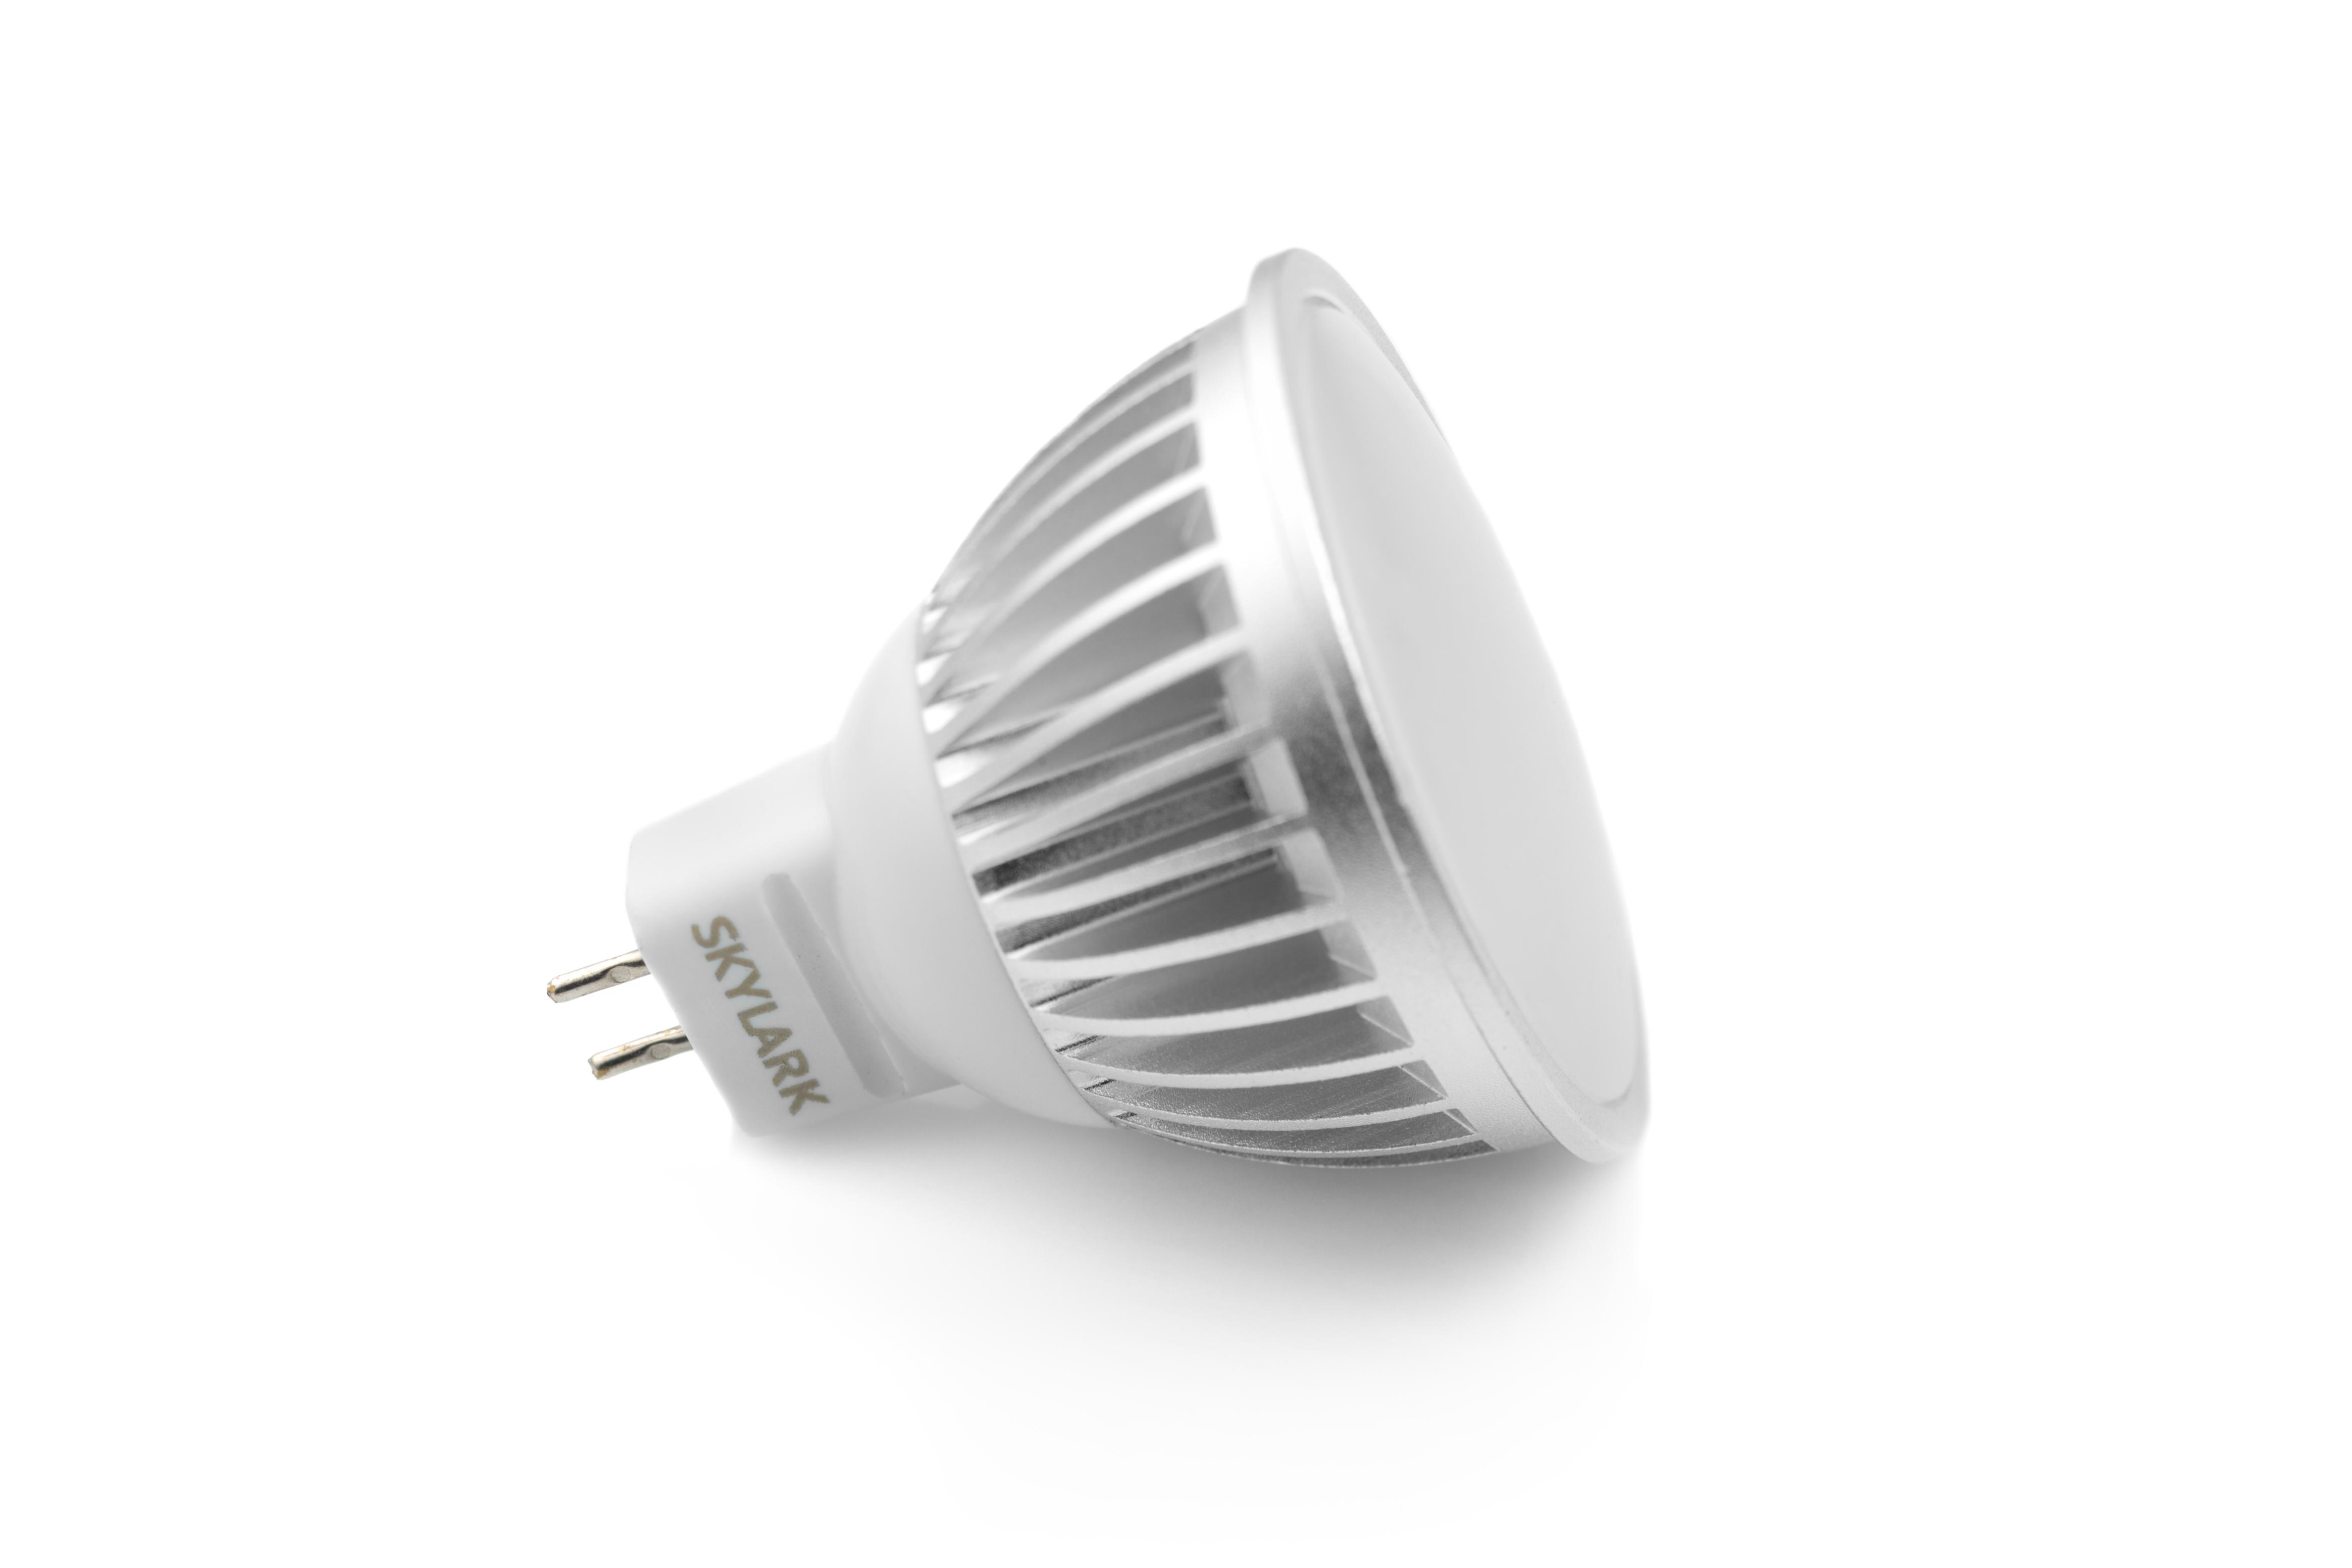 Лампа светодиодная Skylark B035 skylark светодиодная лампа skylark e14 5w 2700k закрученная свеча прозрачная d009